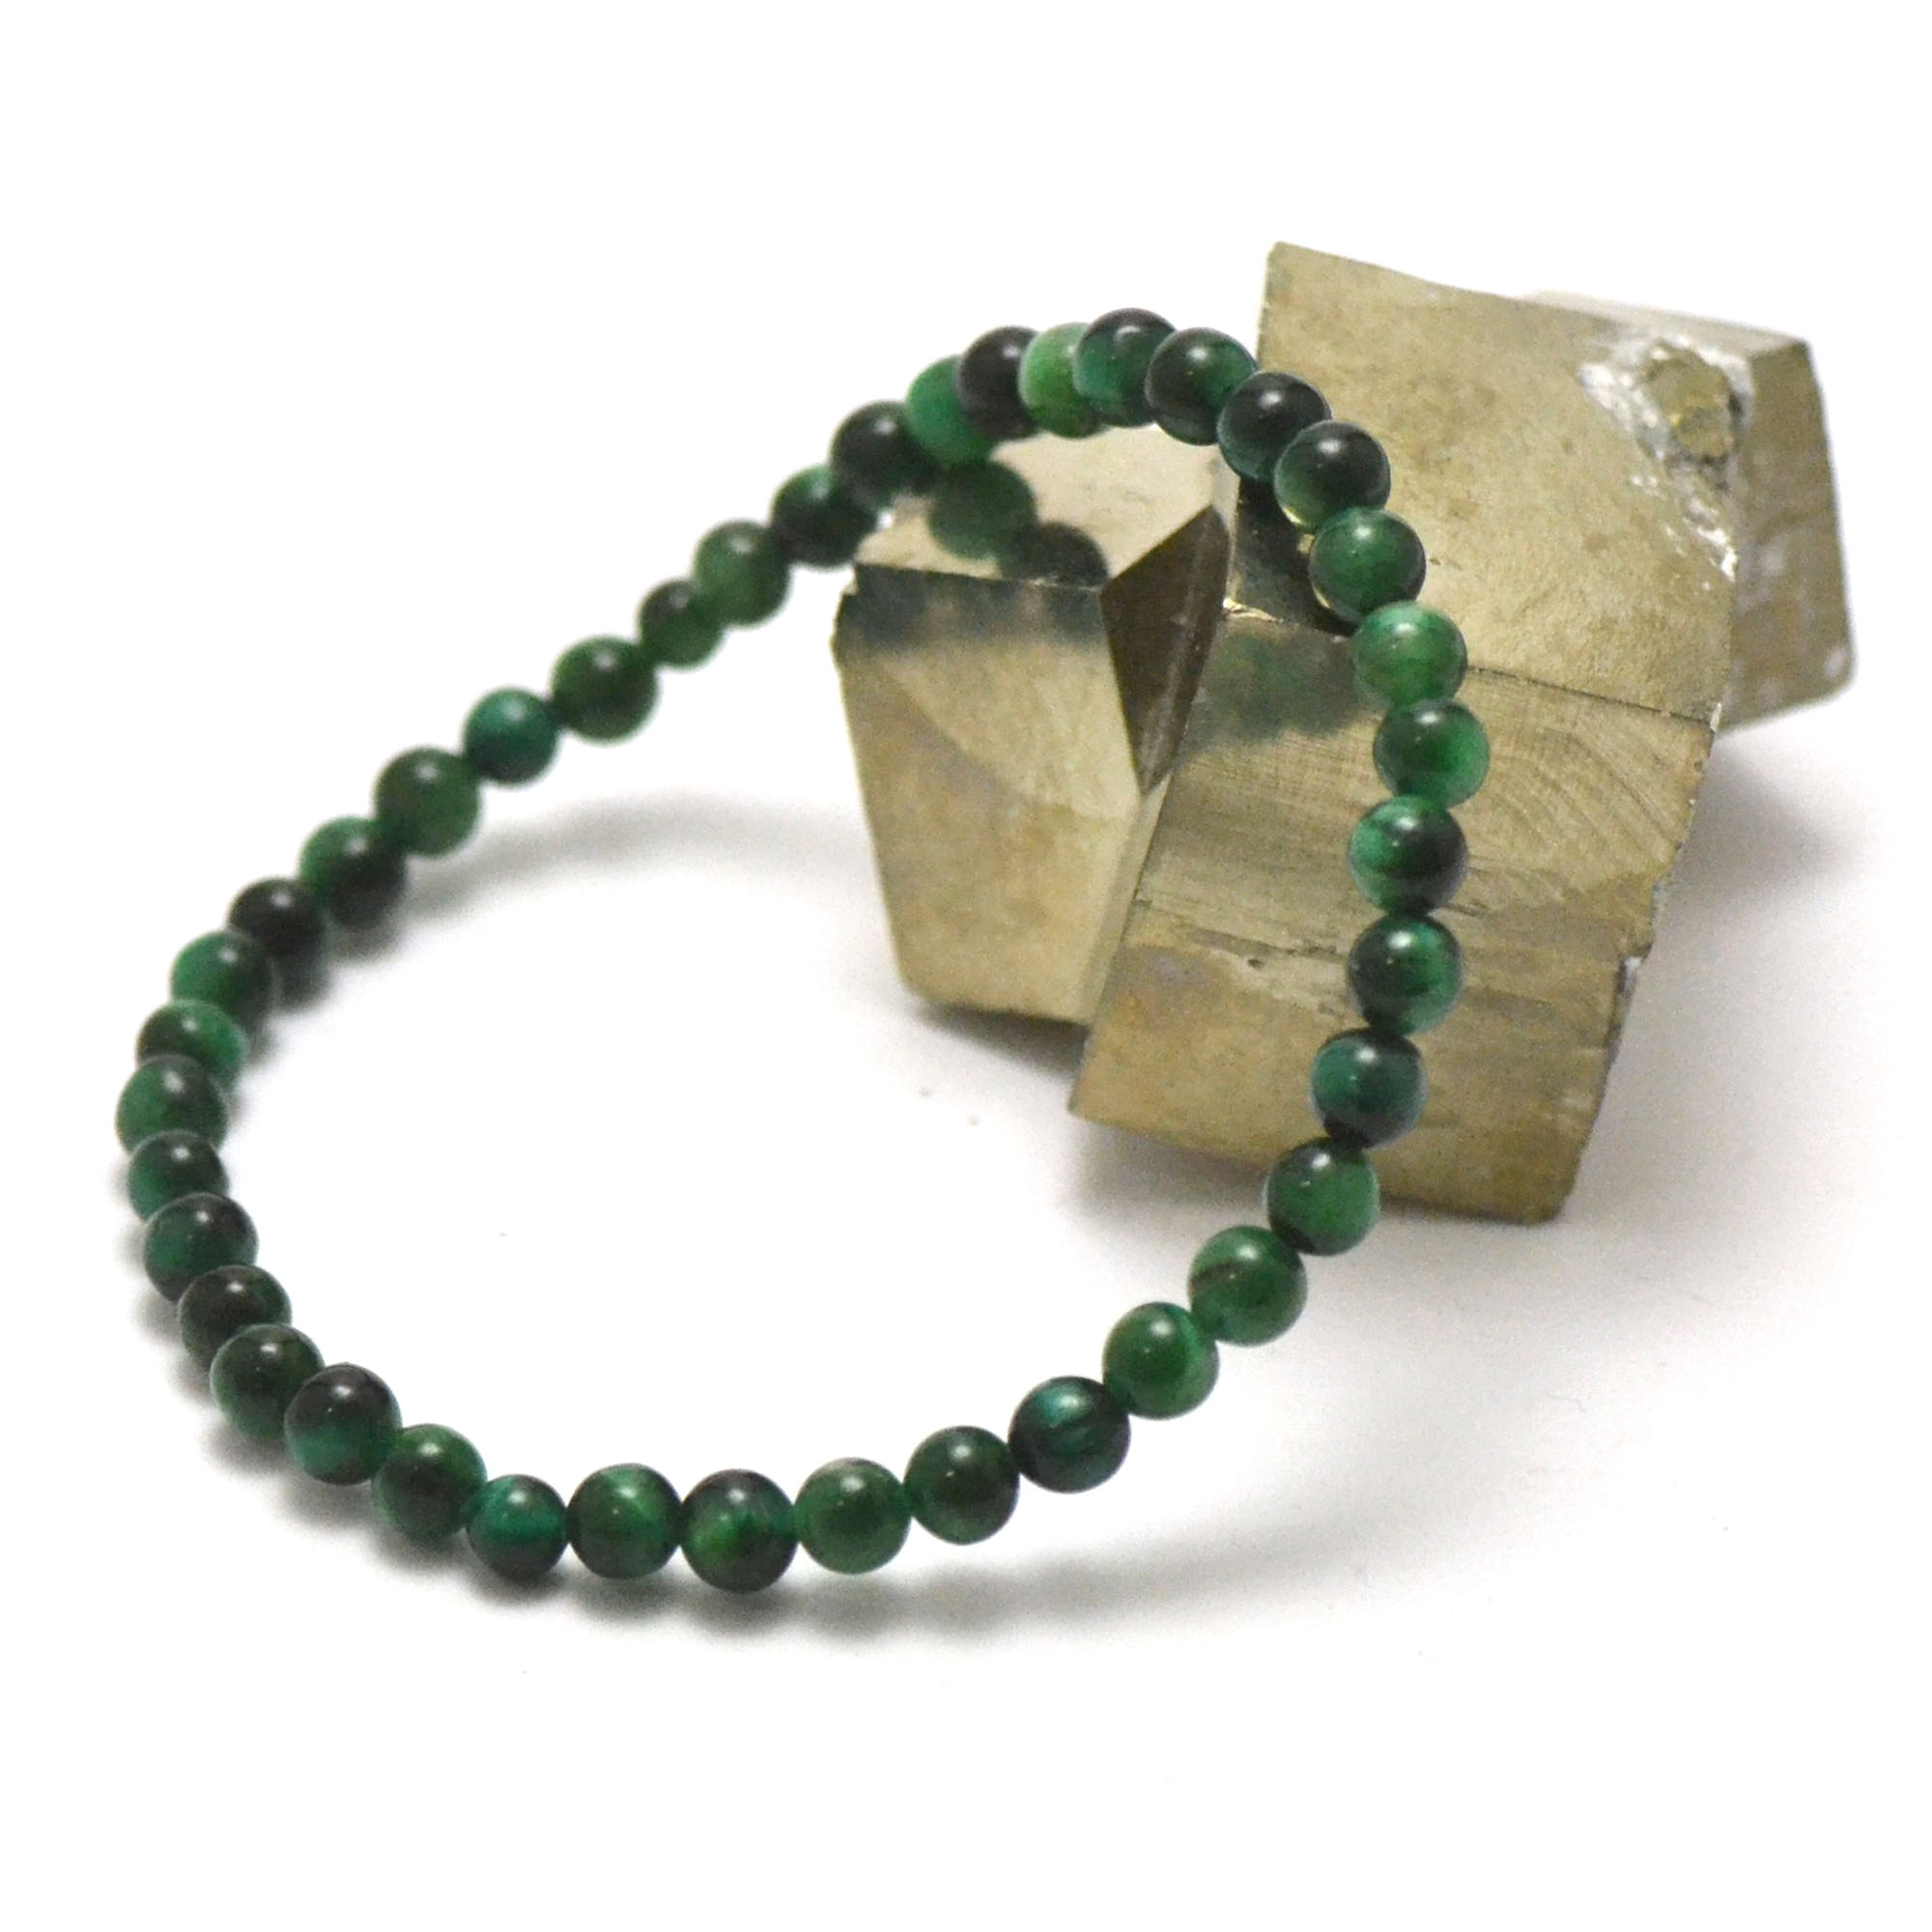 Bracelet oeil de tigre vert perle ronde 4 mm